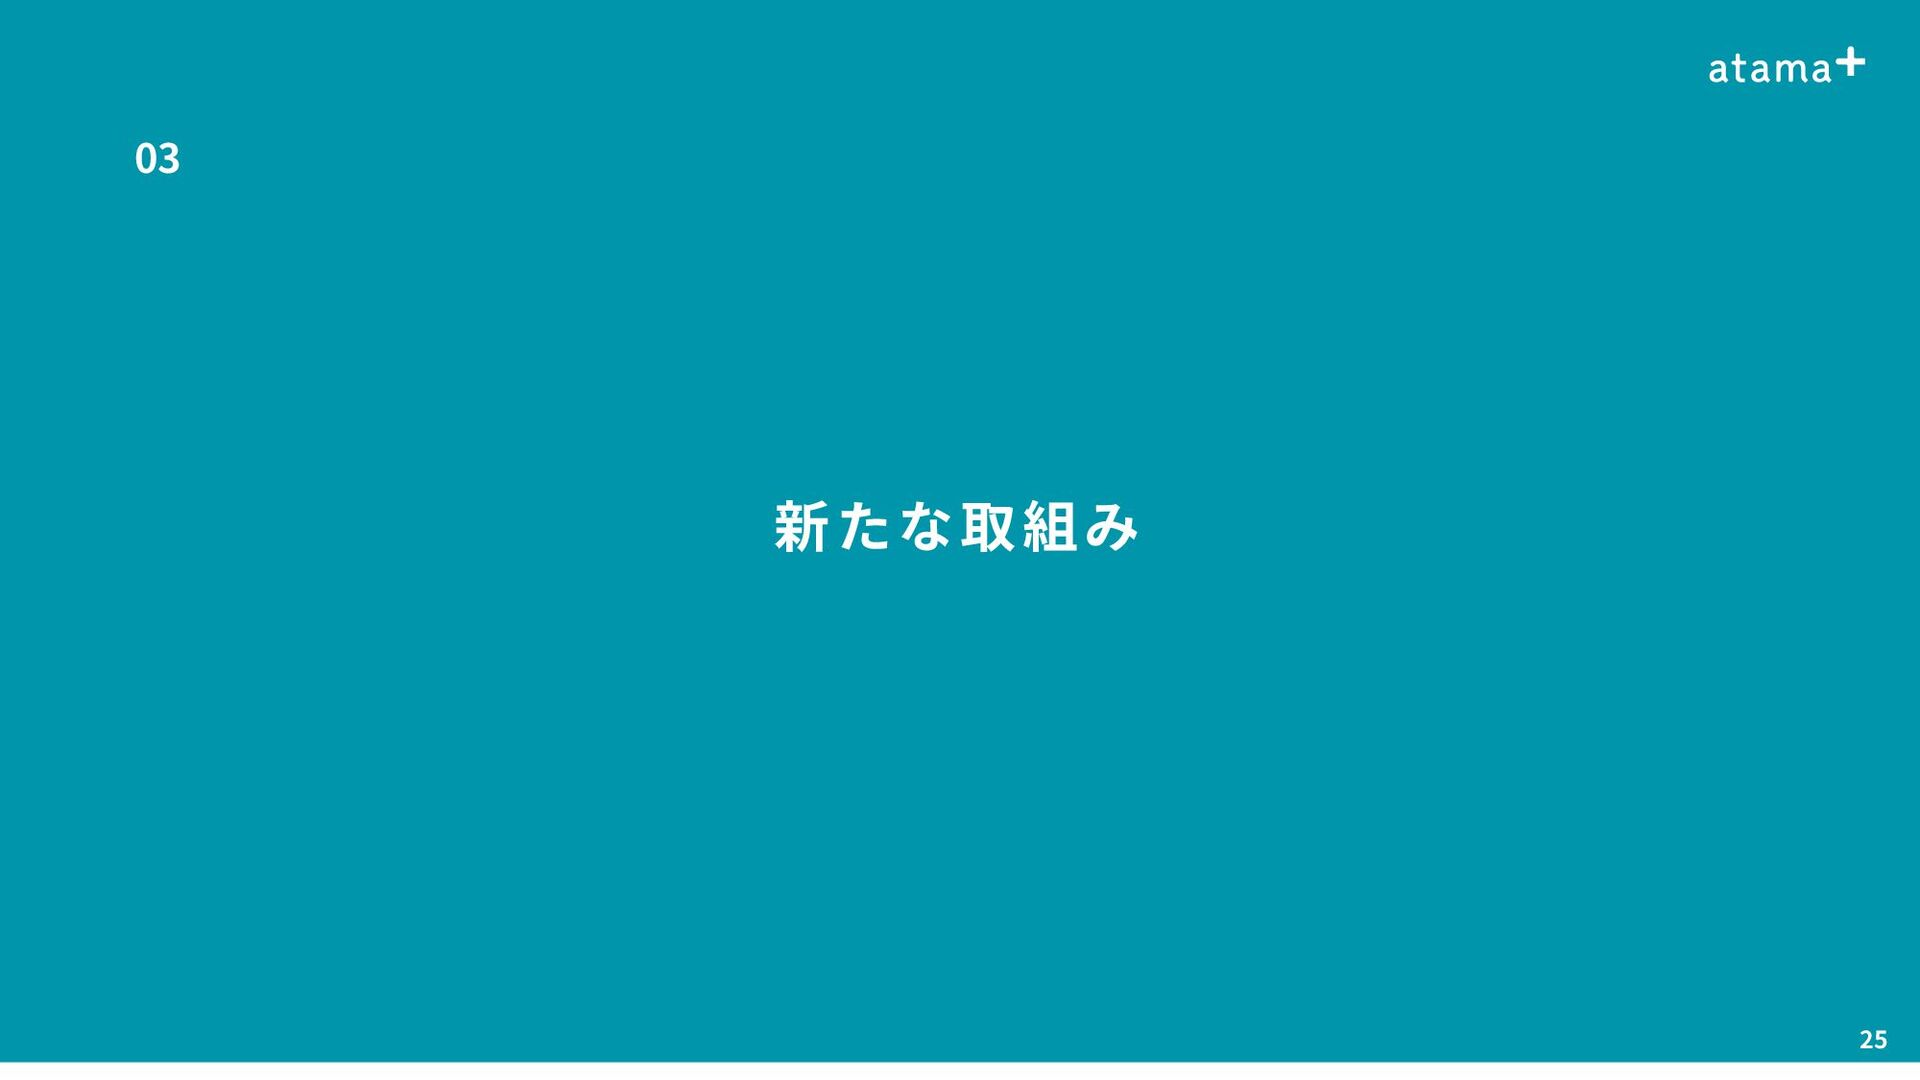 「atama+」Web版を活用したオンライン授業 02 事業内容 25 生徒が自宅でも学習可能...